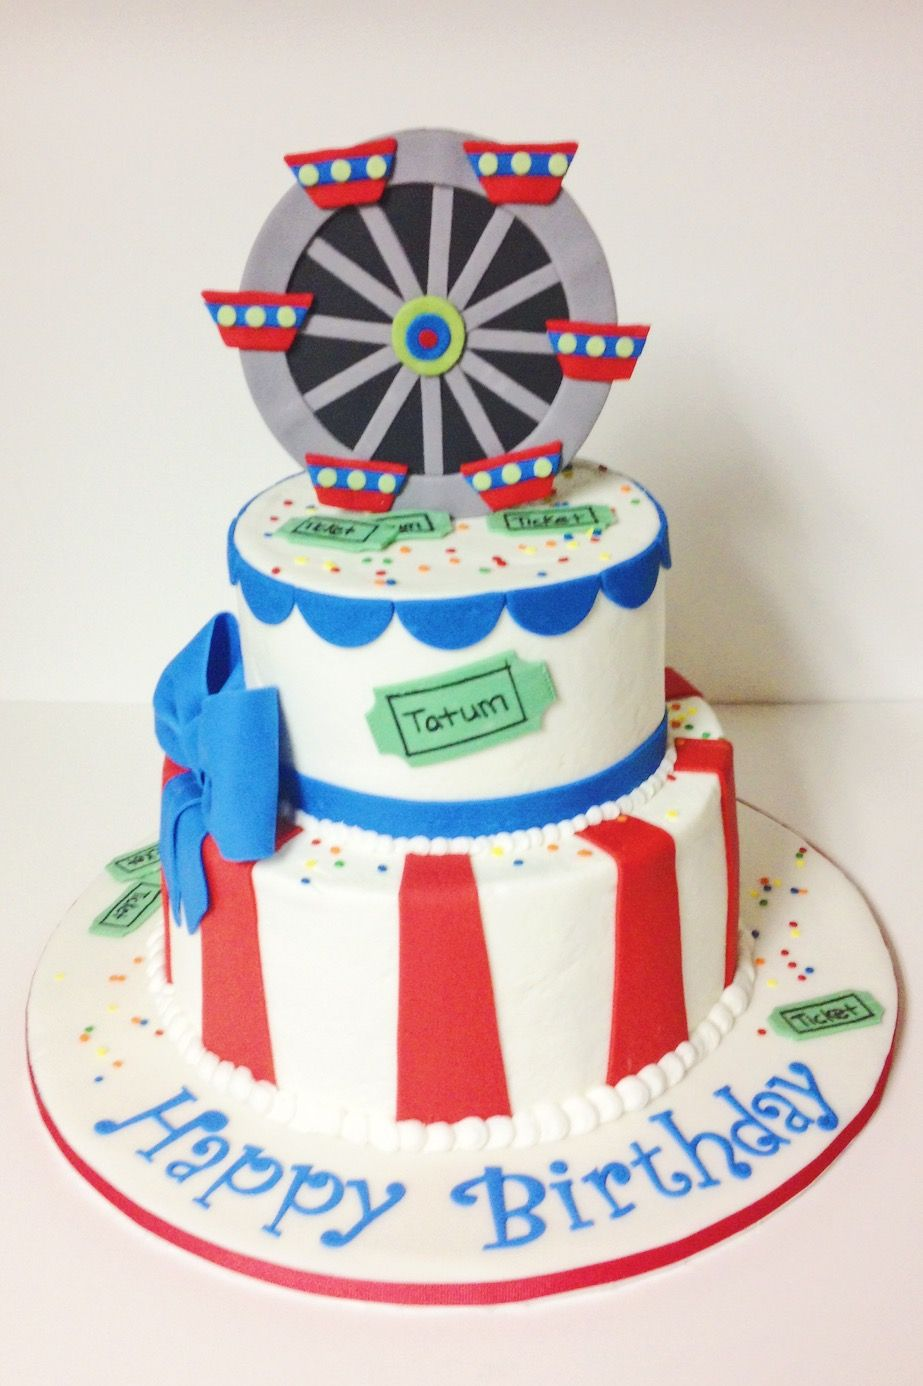 Custom Kids Birthday Cake By A Little Slice Of Heaven Bakery In Atlanta GA